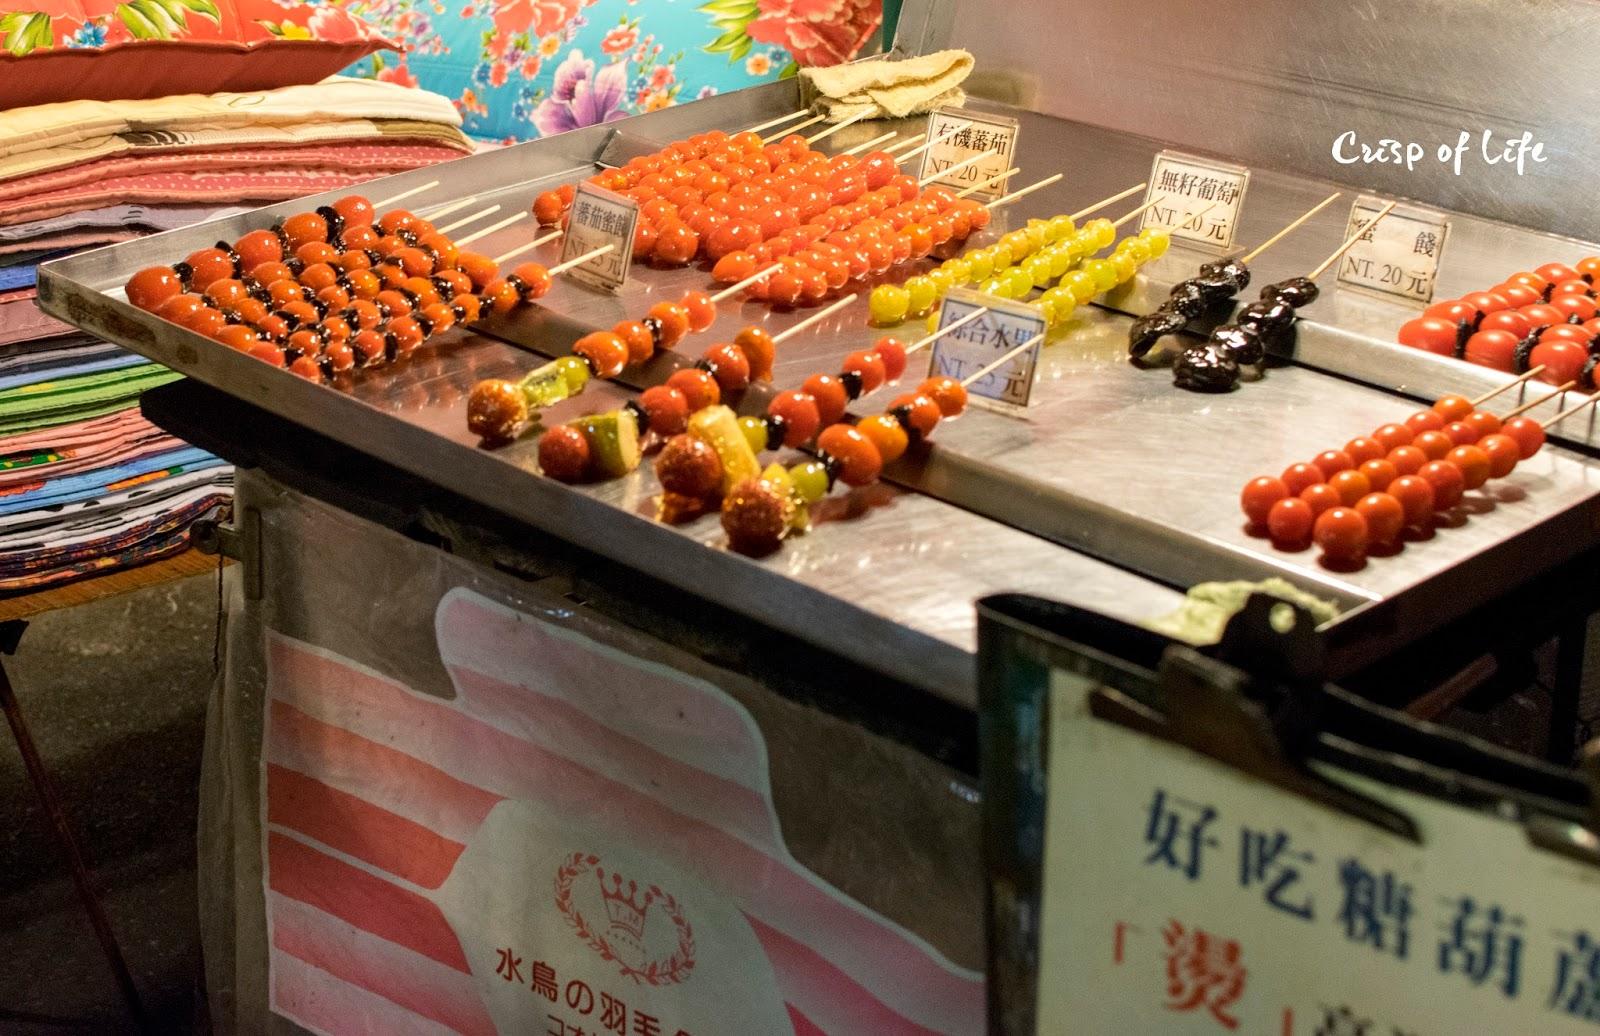 [TAIPEI 台北] Day 5: Keelung Miaokou night market 第五天:基隆庙口夜市